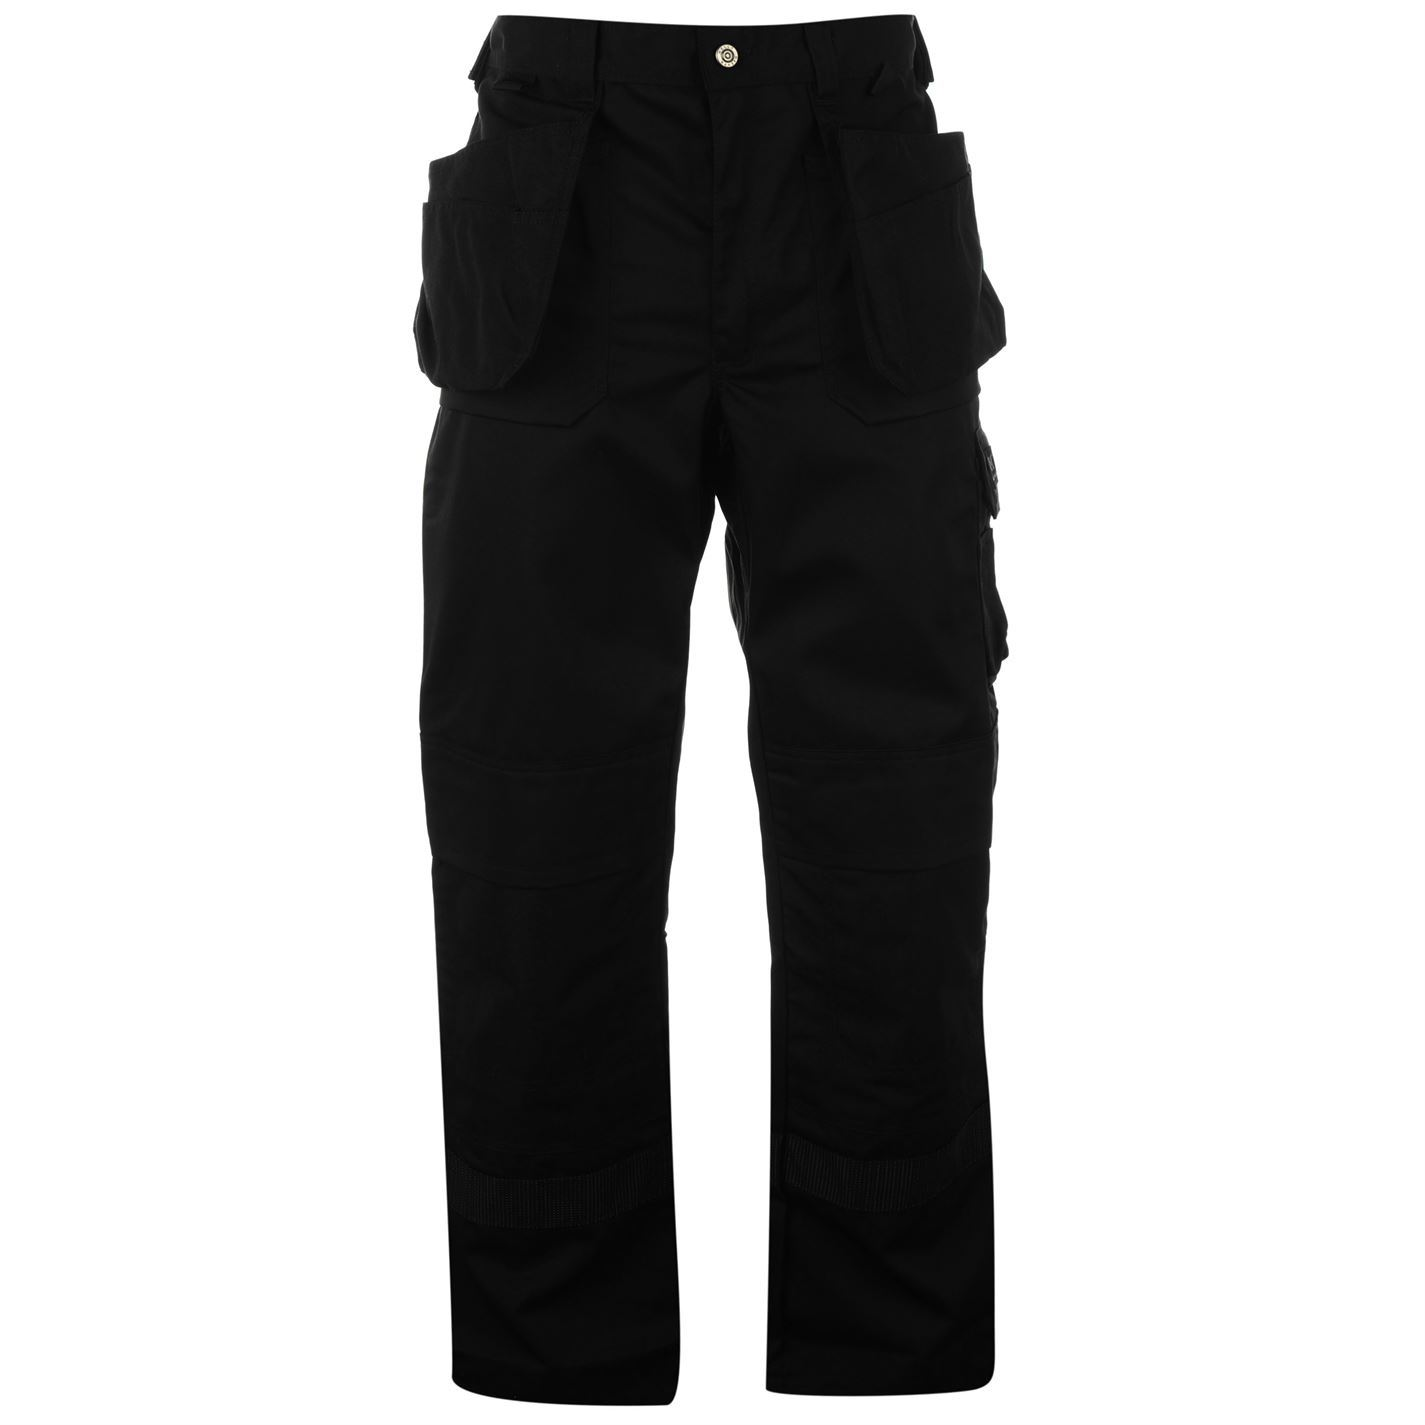 Elegant Womens Cigarette Trousers Ladies Elasticated Stretch Skinny Pockets Slim Pants | EBay